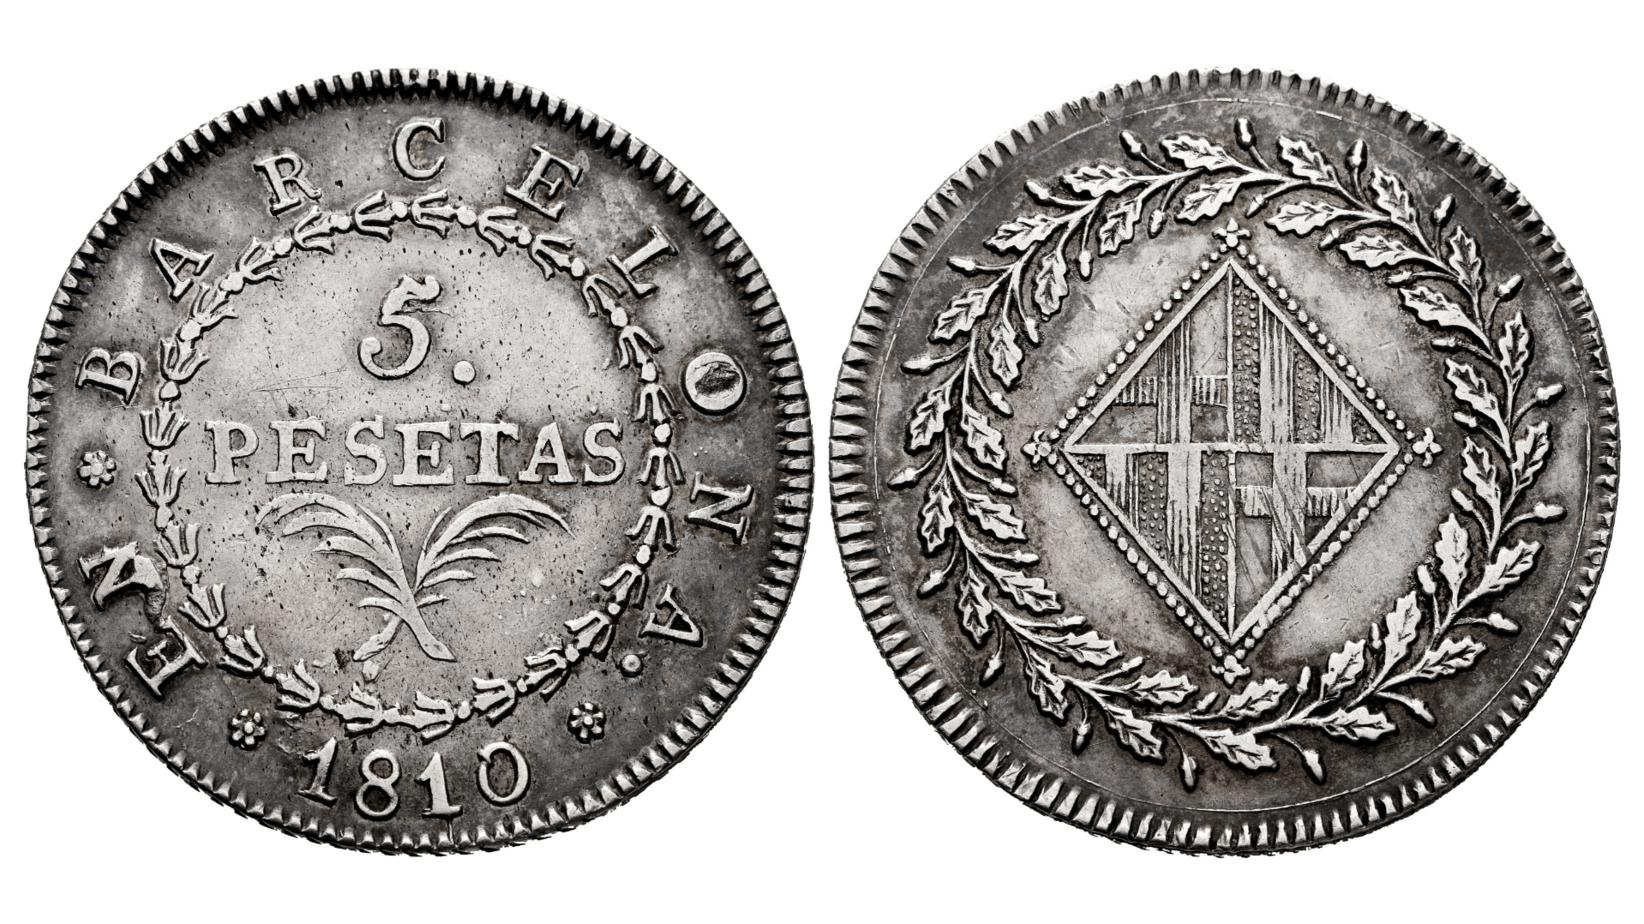 5 pesetas 1810